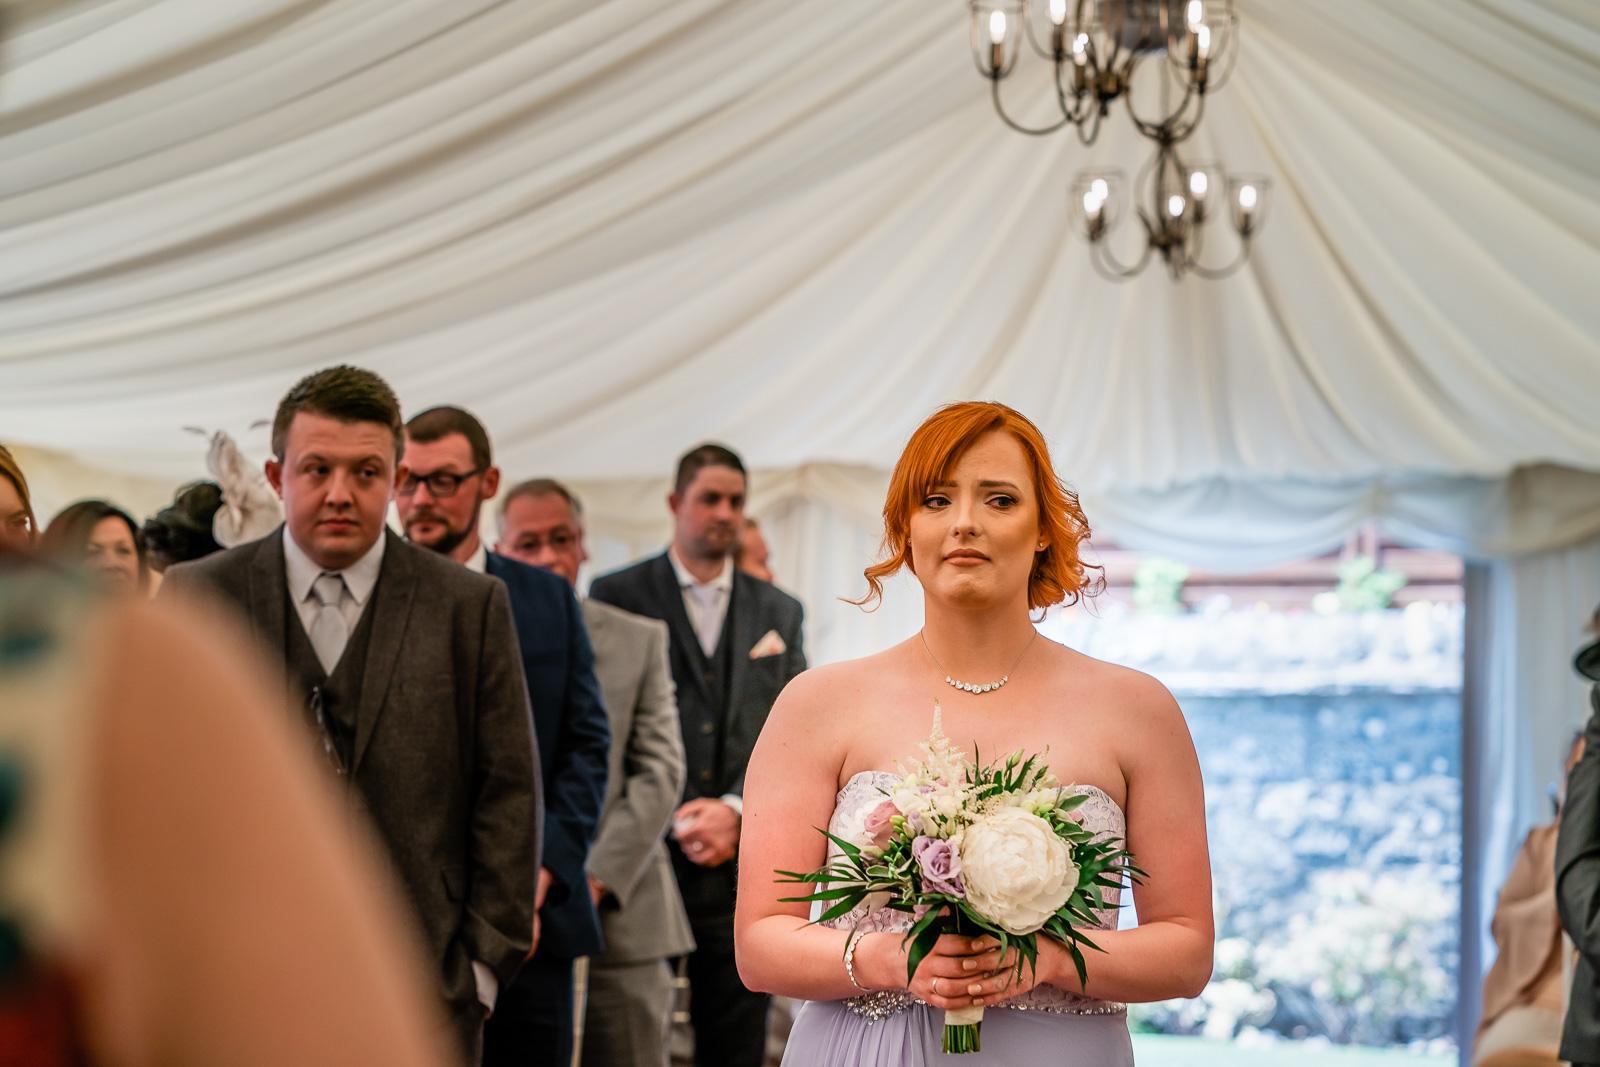 cornhill_castle_wedding_biggar_dearlyphotography (88 of 448).jpg